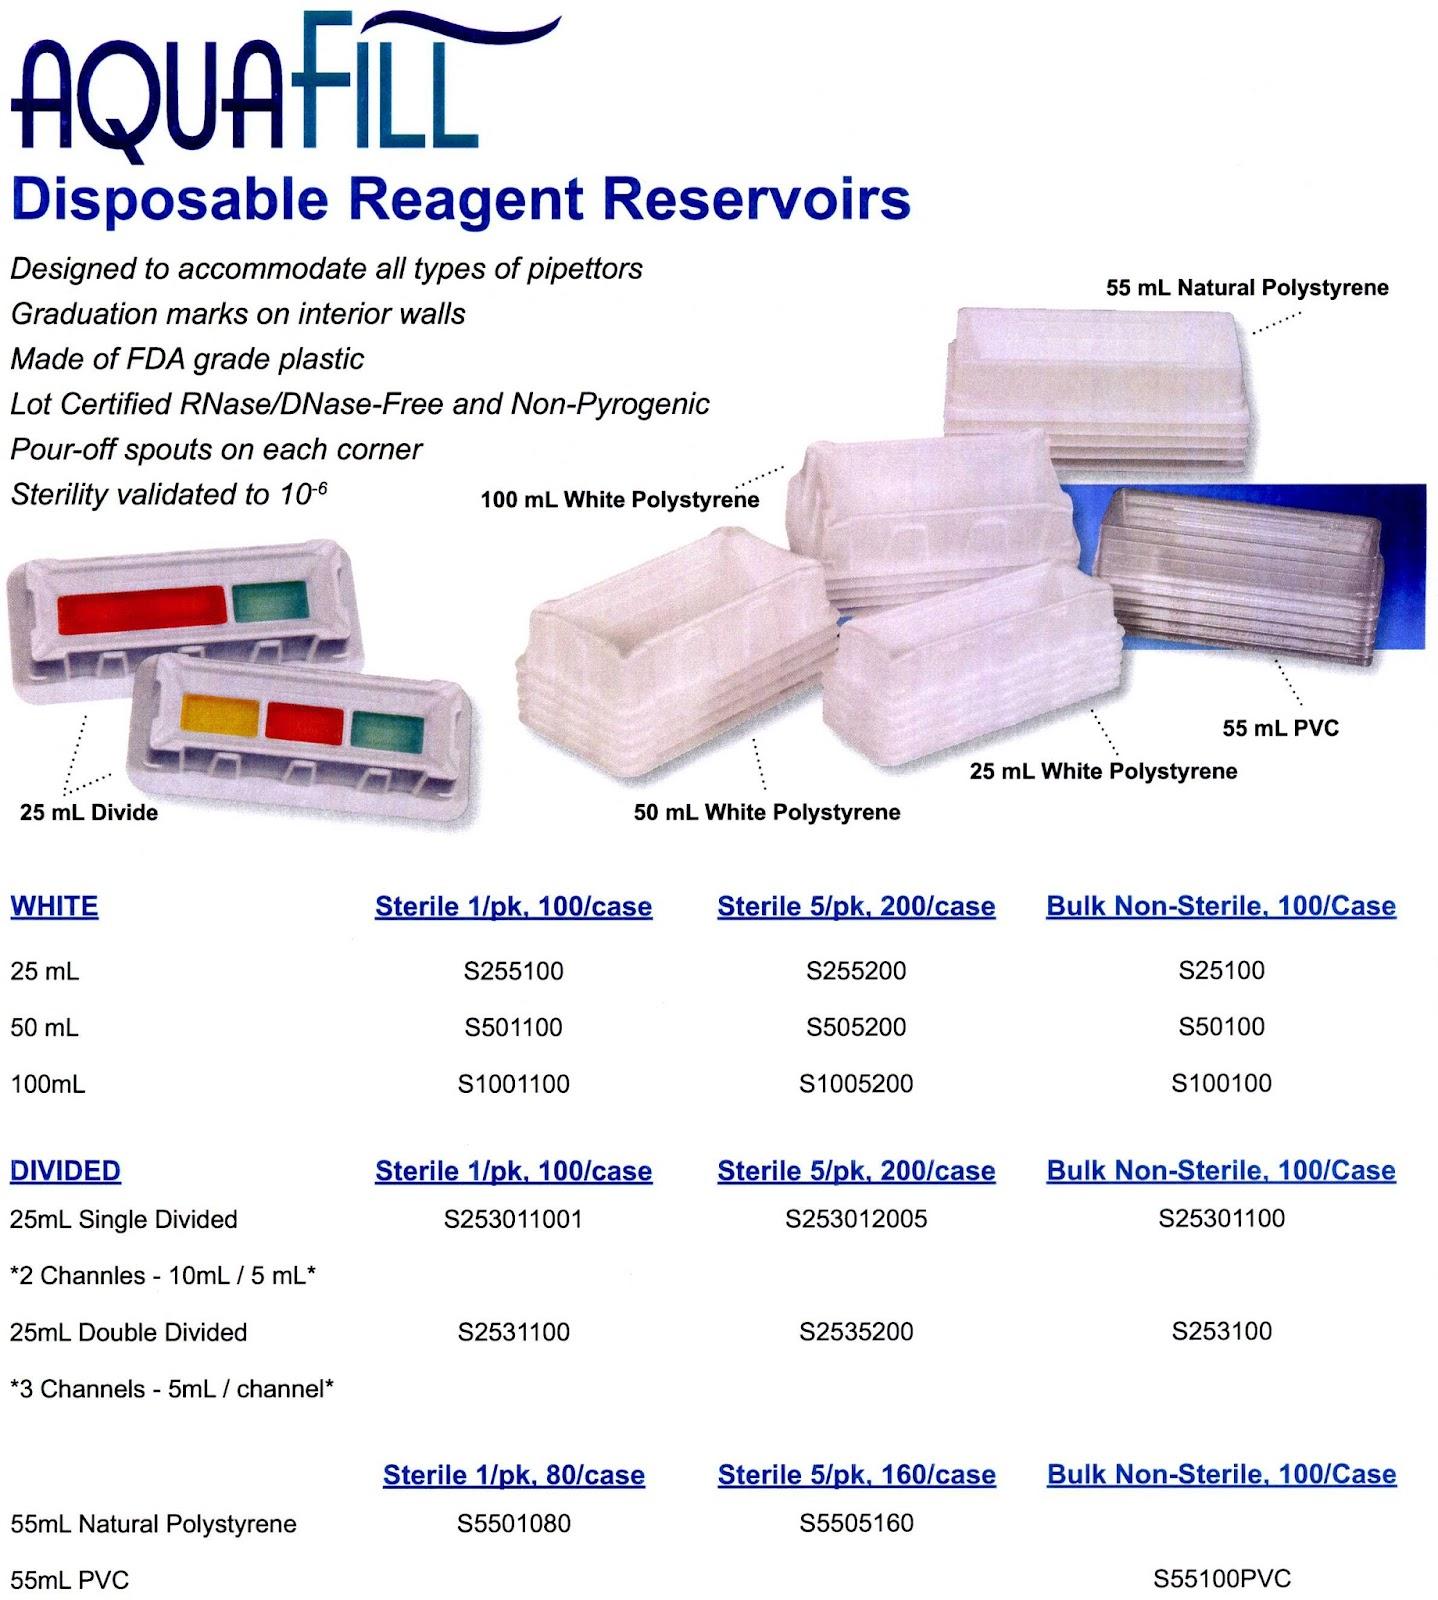 Reservoir info.jpg